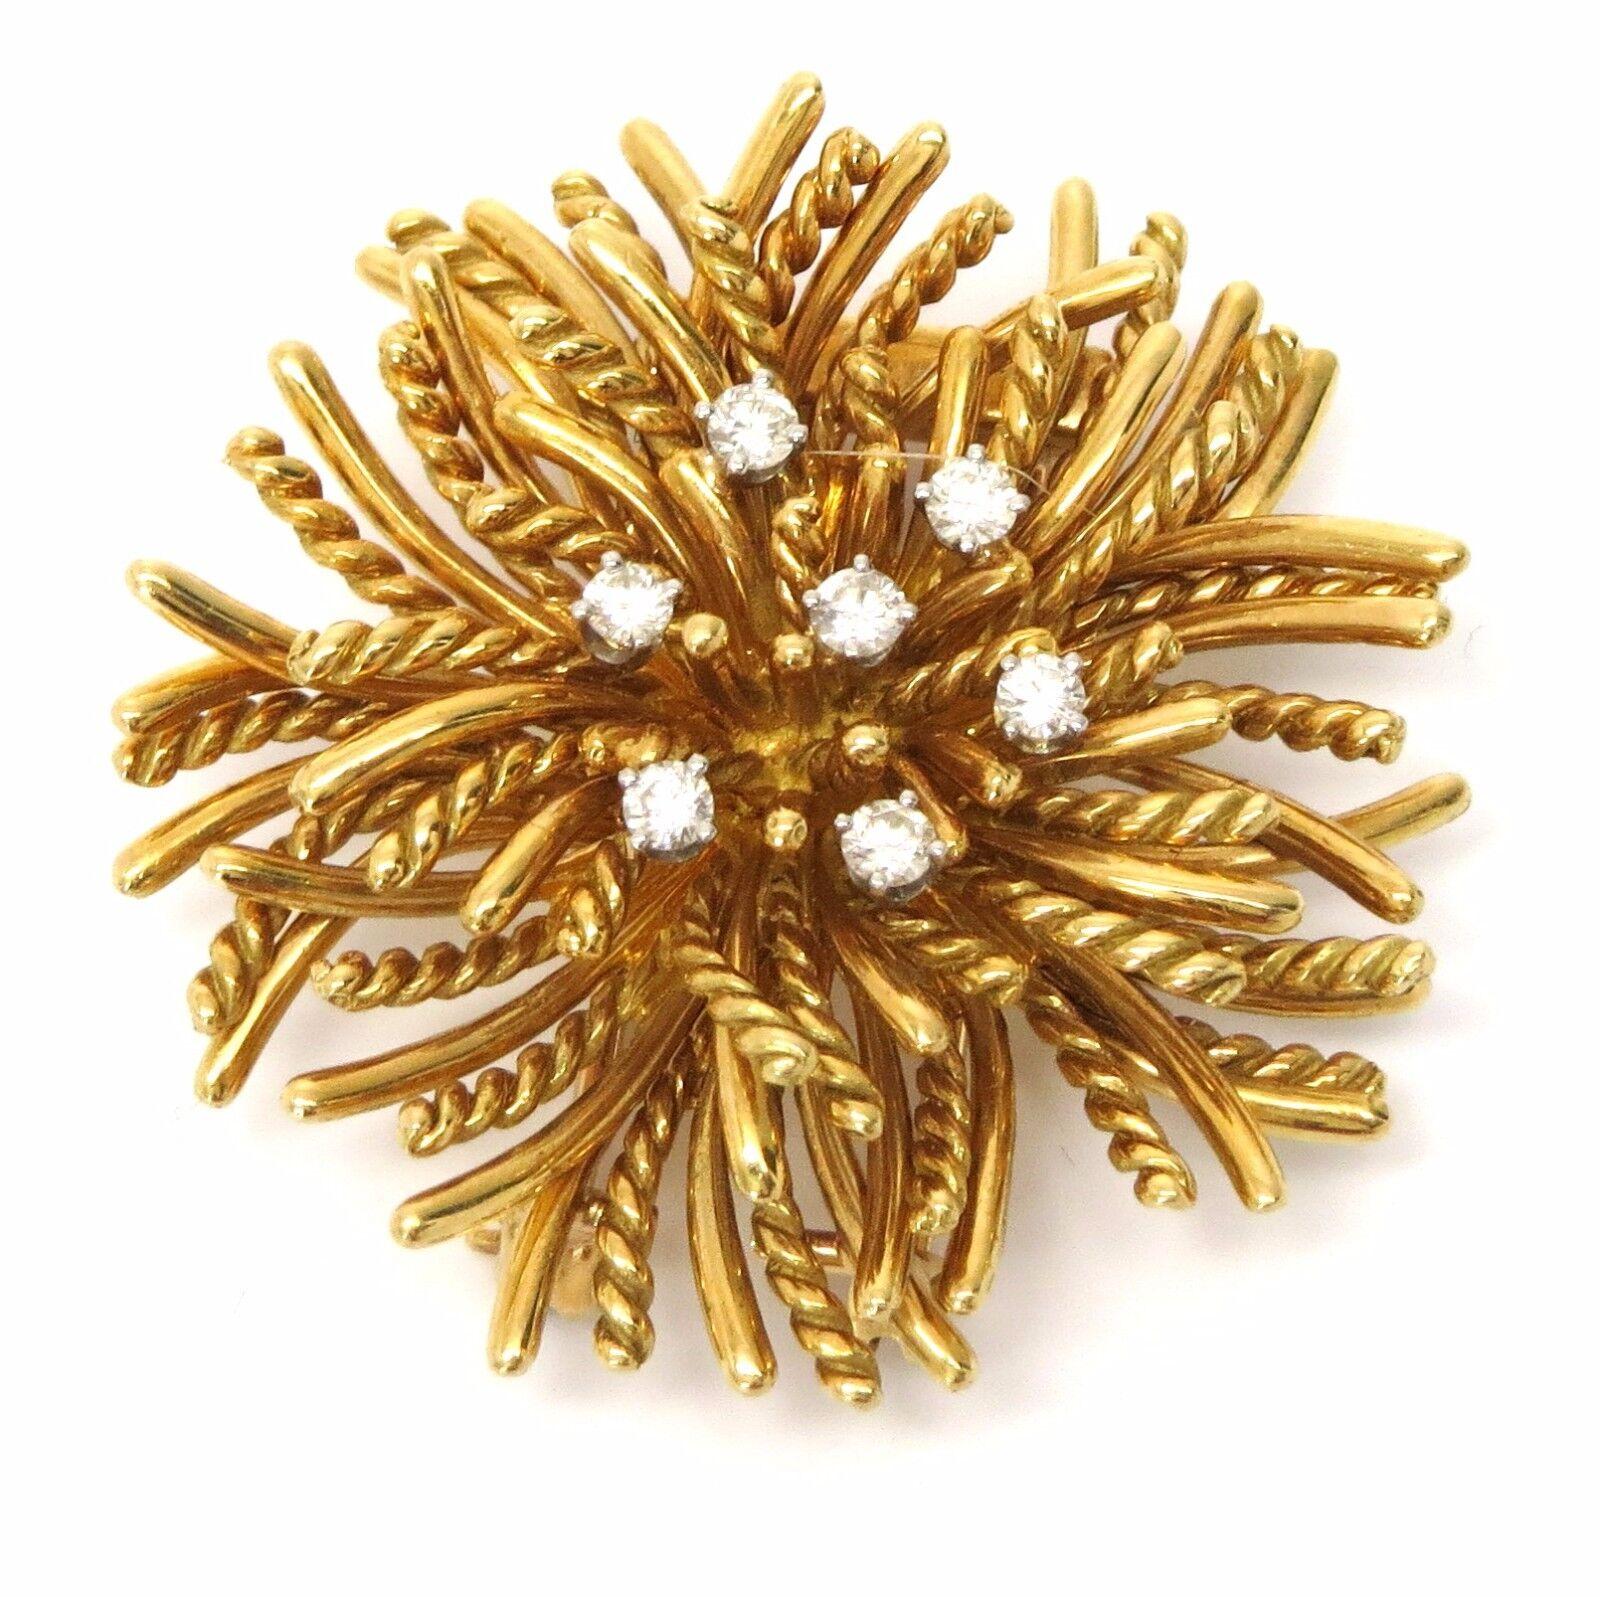 Tiffany & Co Anemone Gold Diamond Brooch Pin